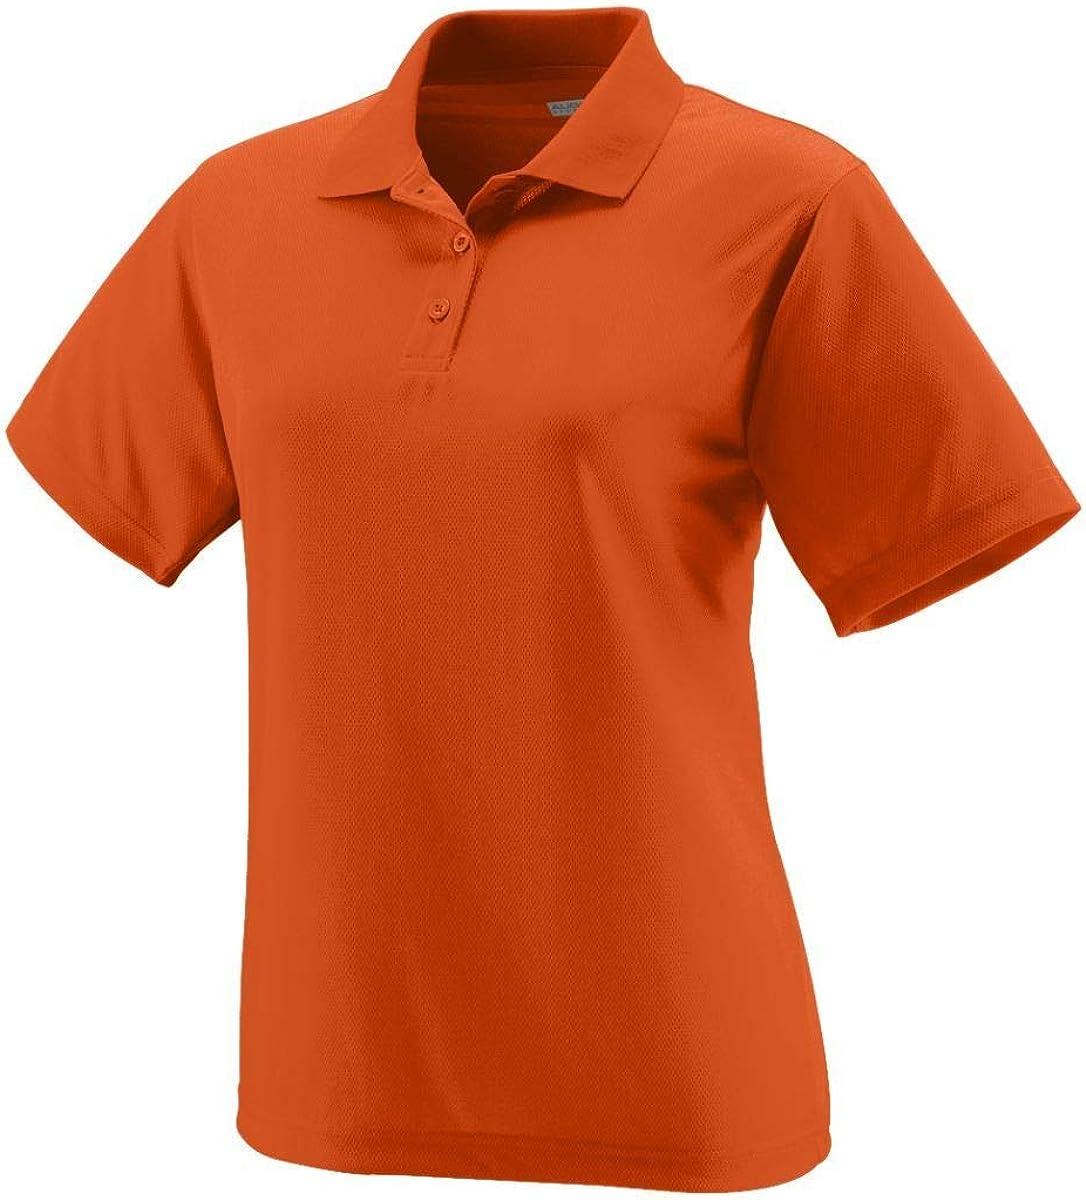 Augusta Sportswear 5097 - Ladies' Wicking Mesh Sport Shirt